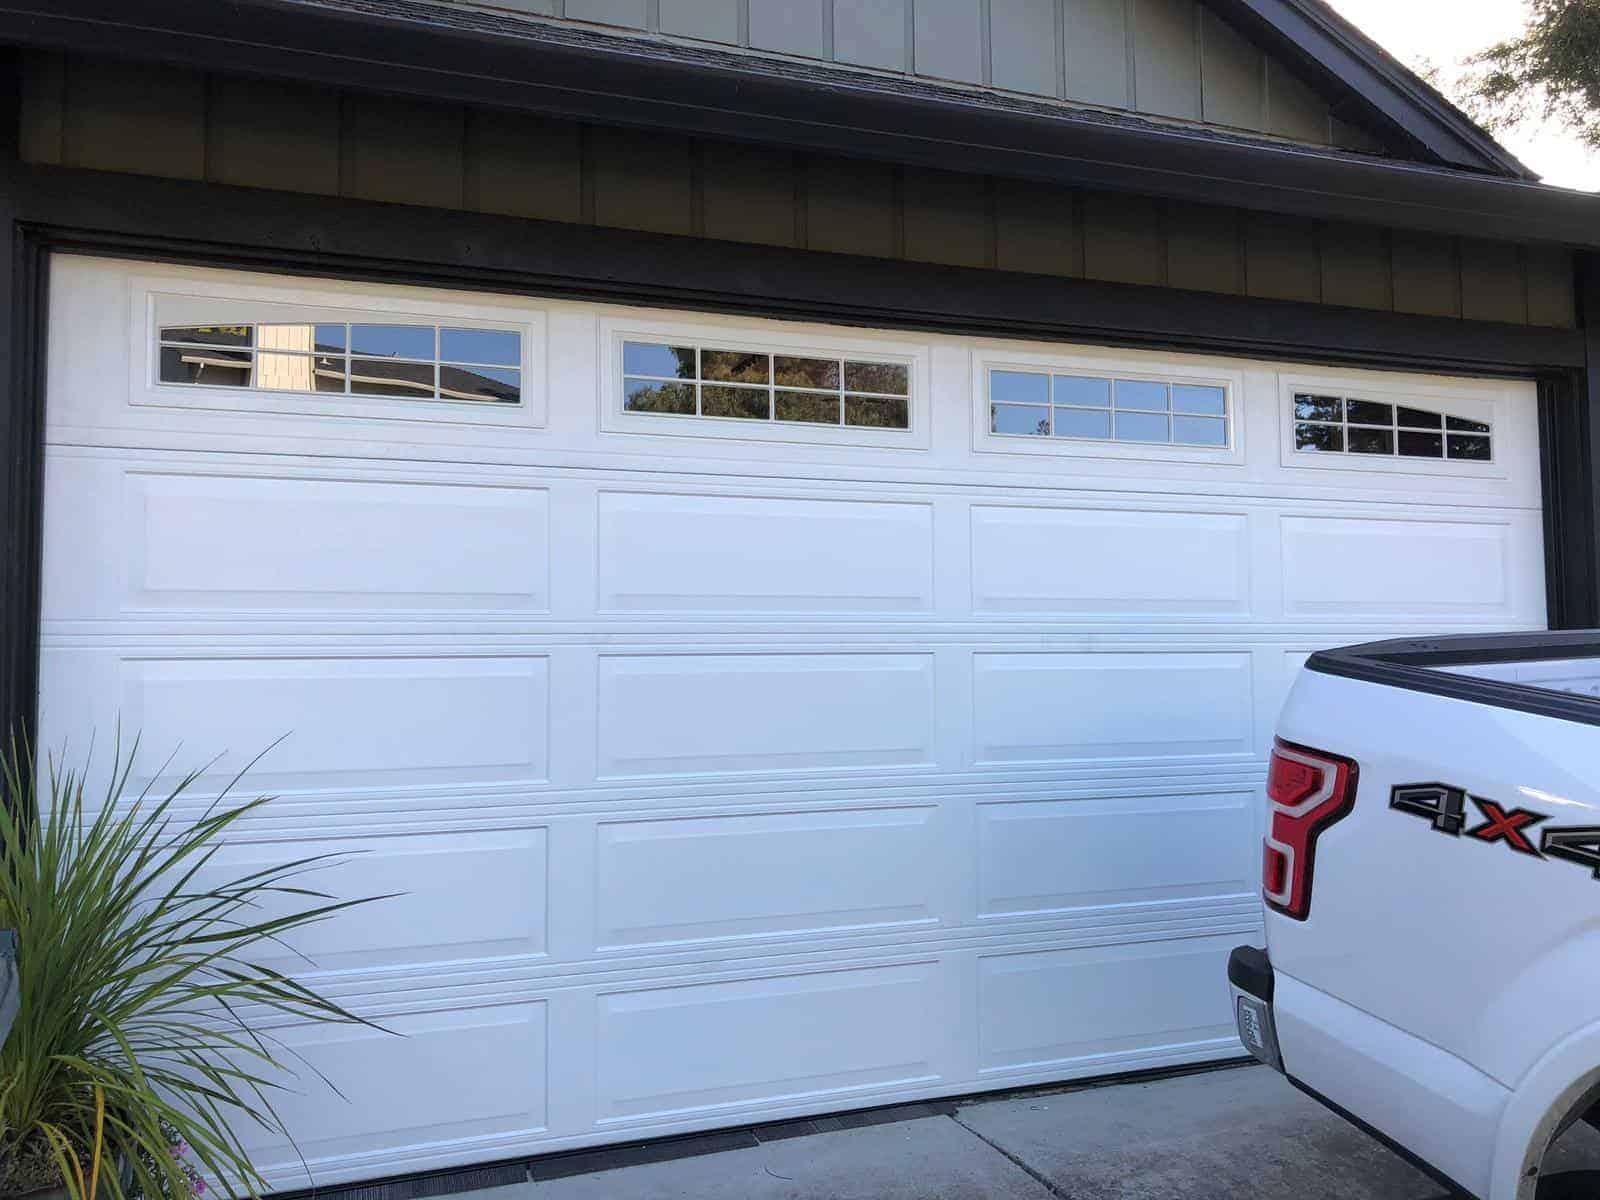 El Cerrito CA Garage Door Repair & Replacement